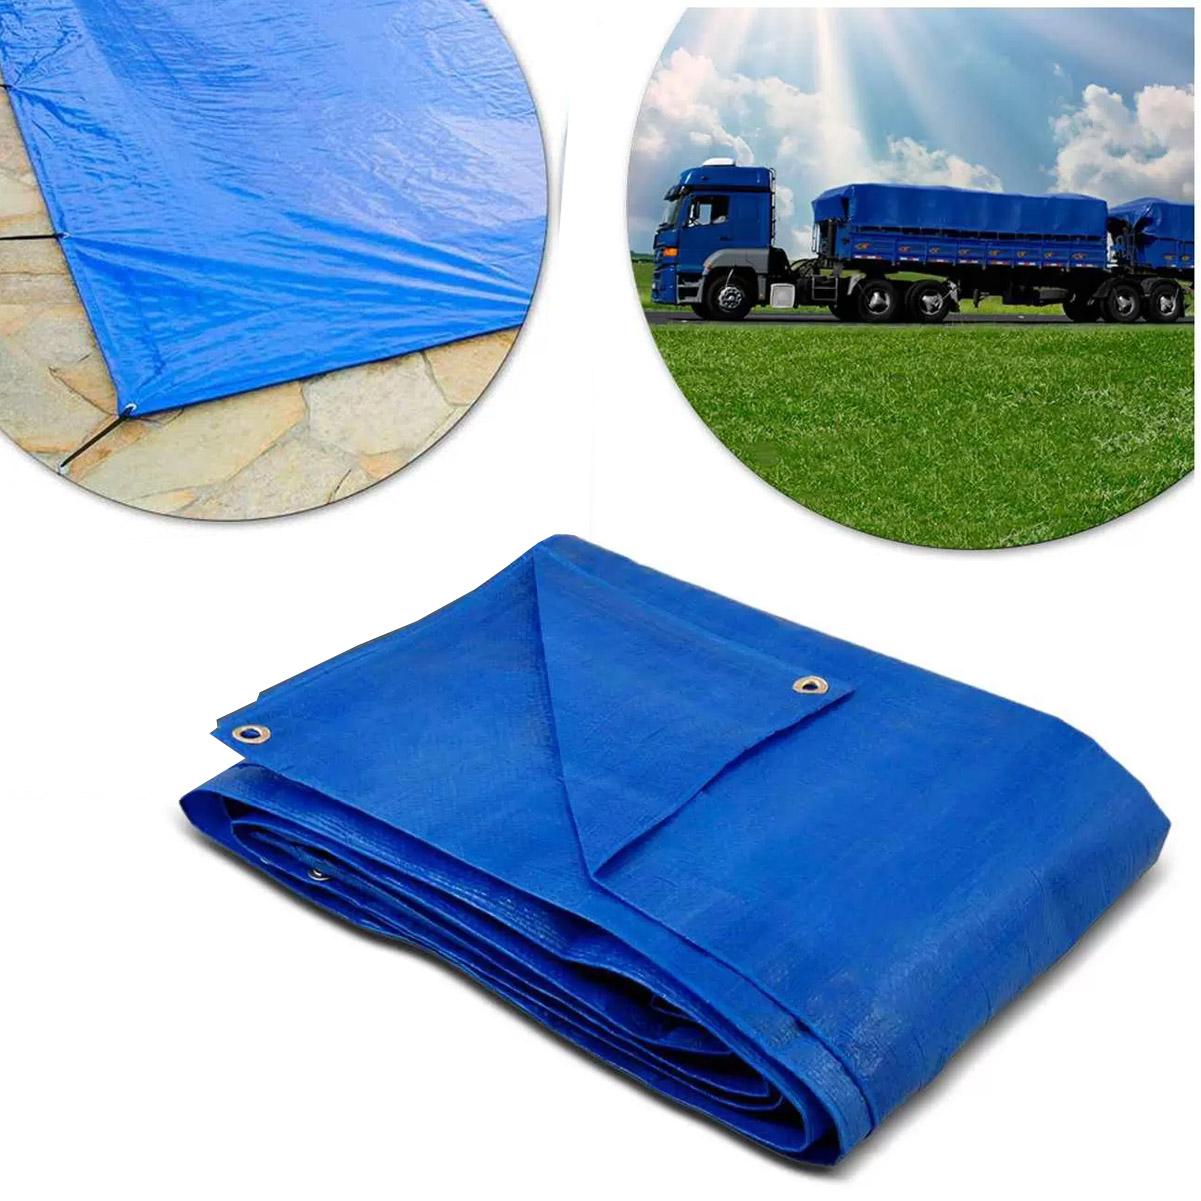 Lona Plástica 7,5x6m Impermeável Reforçado 70gsm Importway